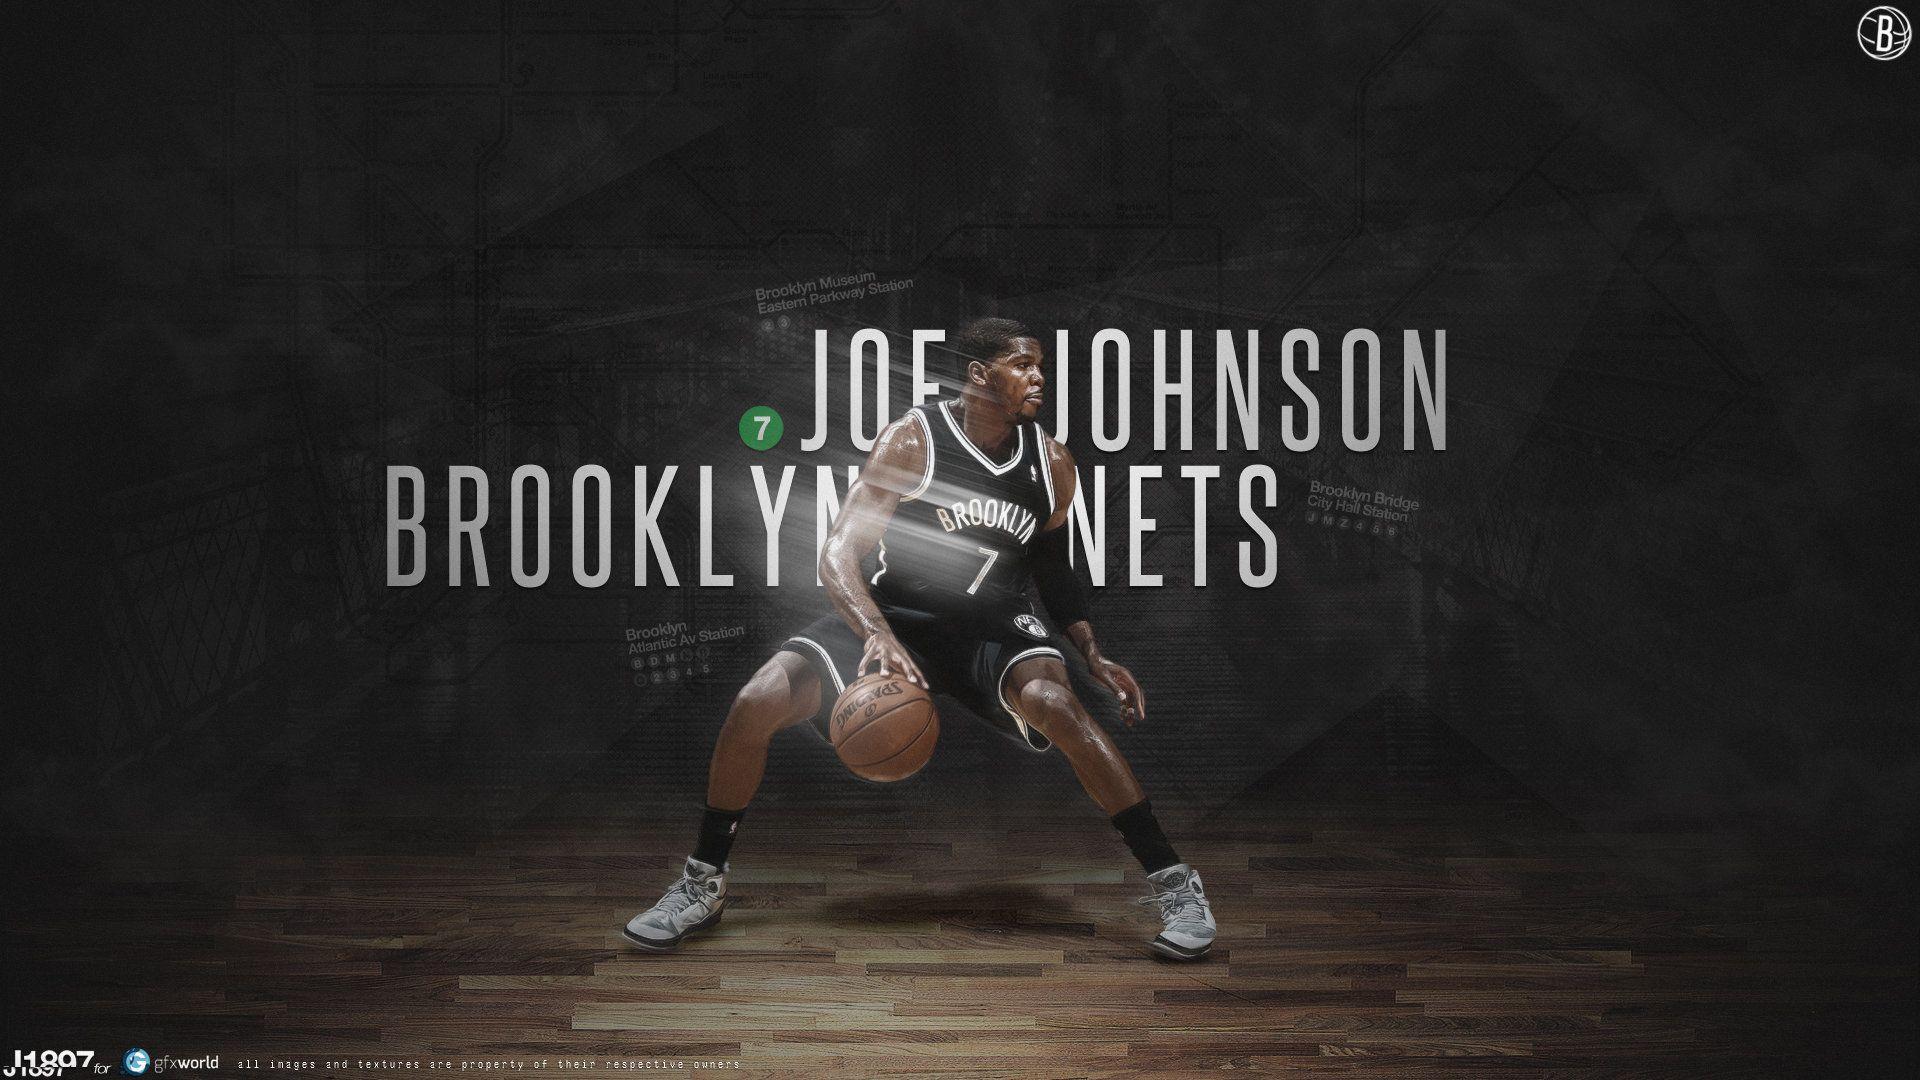 Joe Johnson Nets Wallpaper